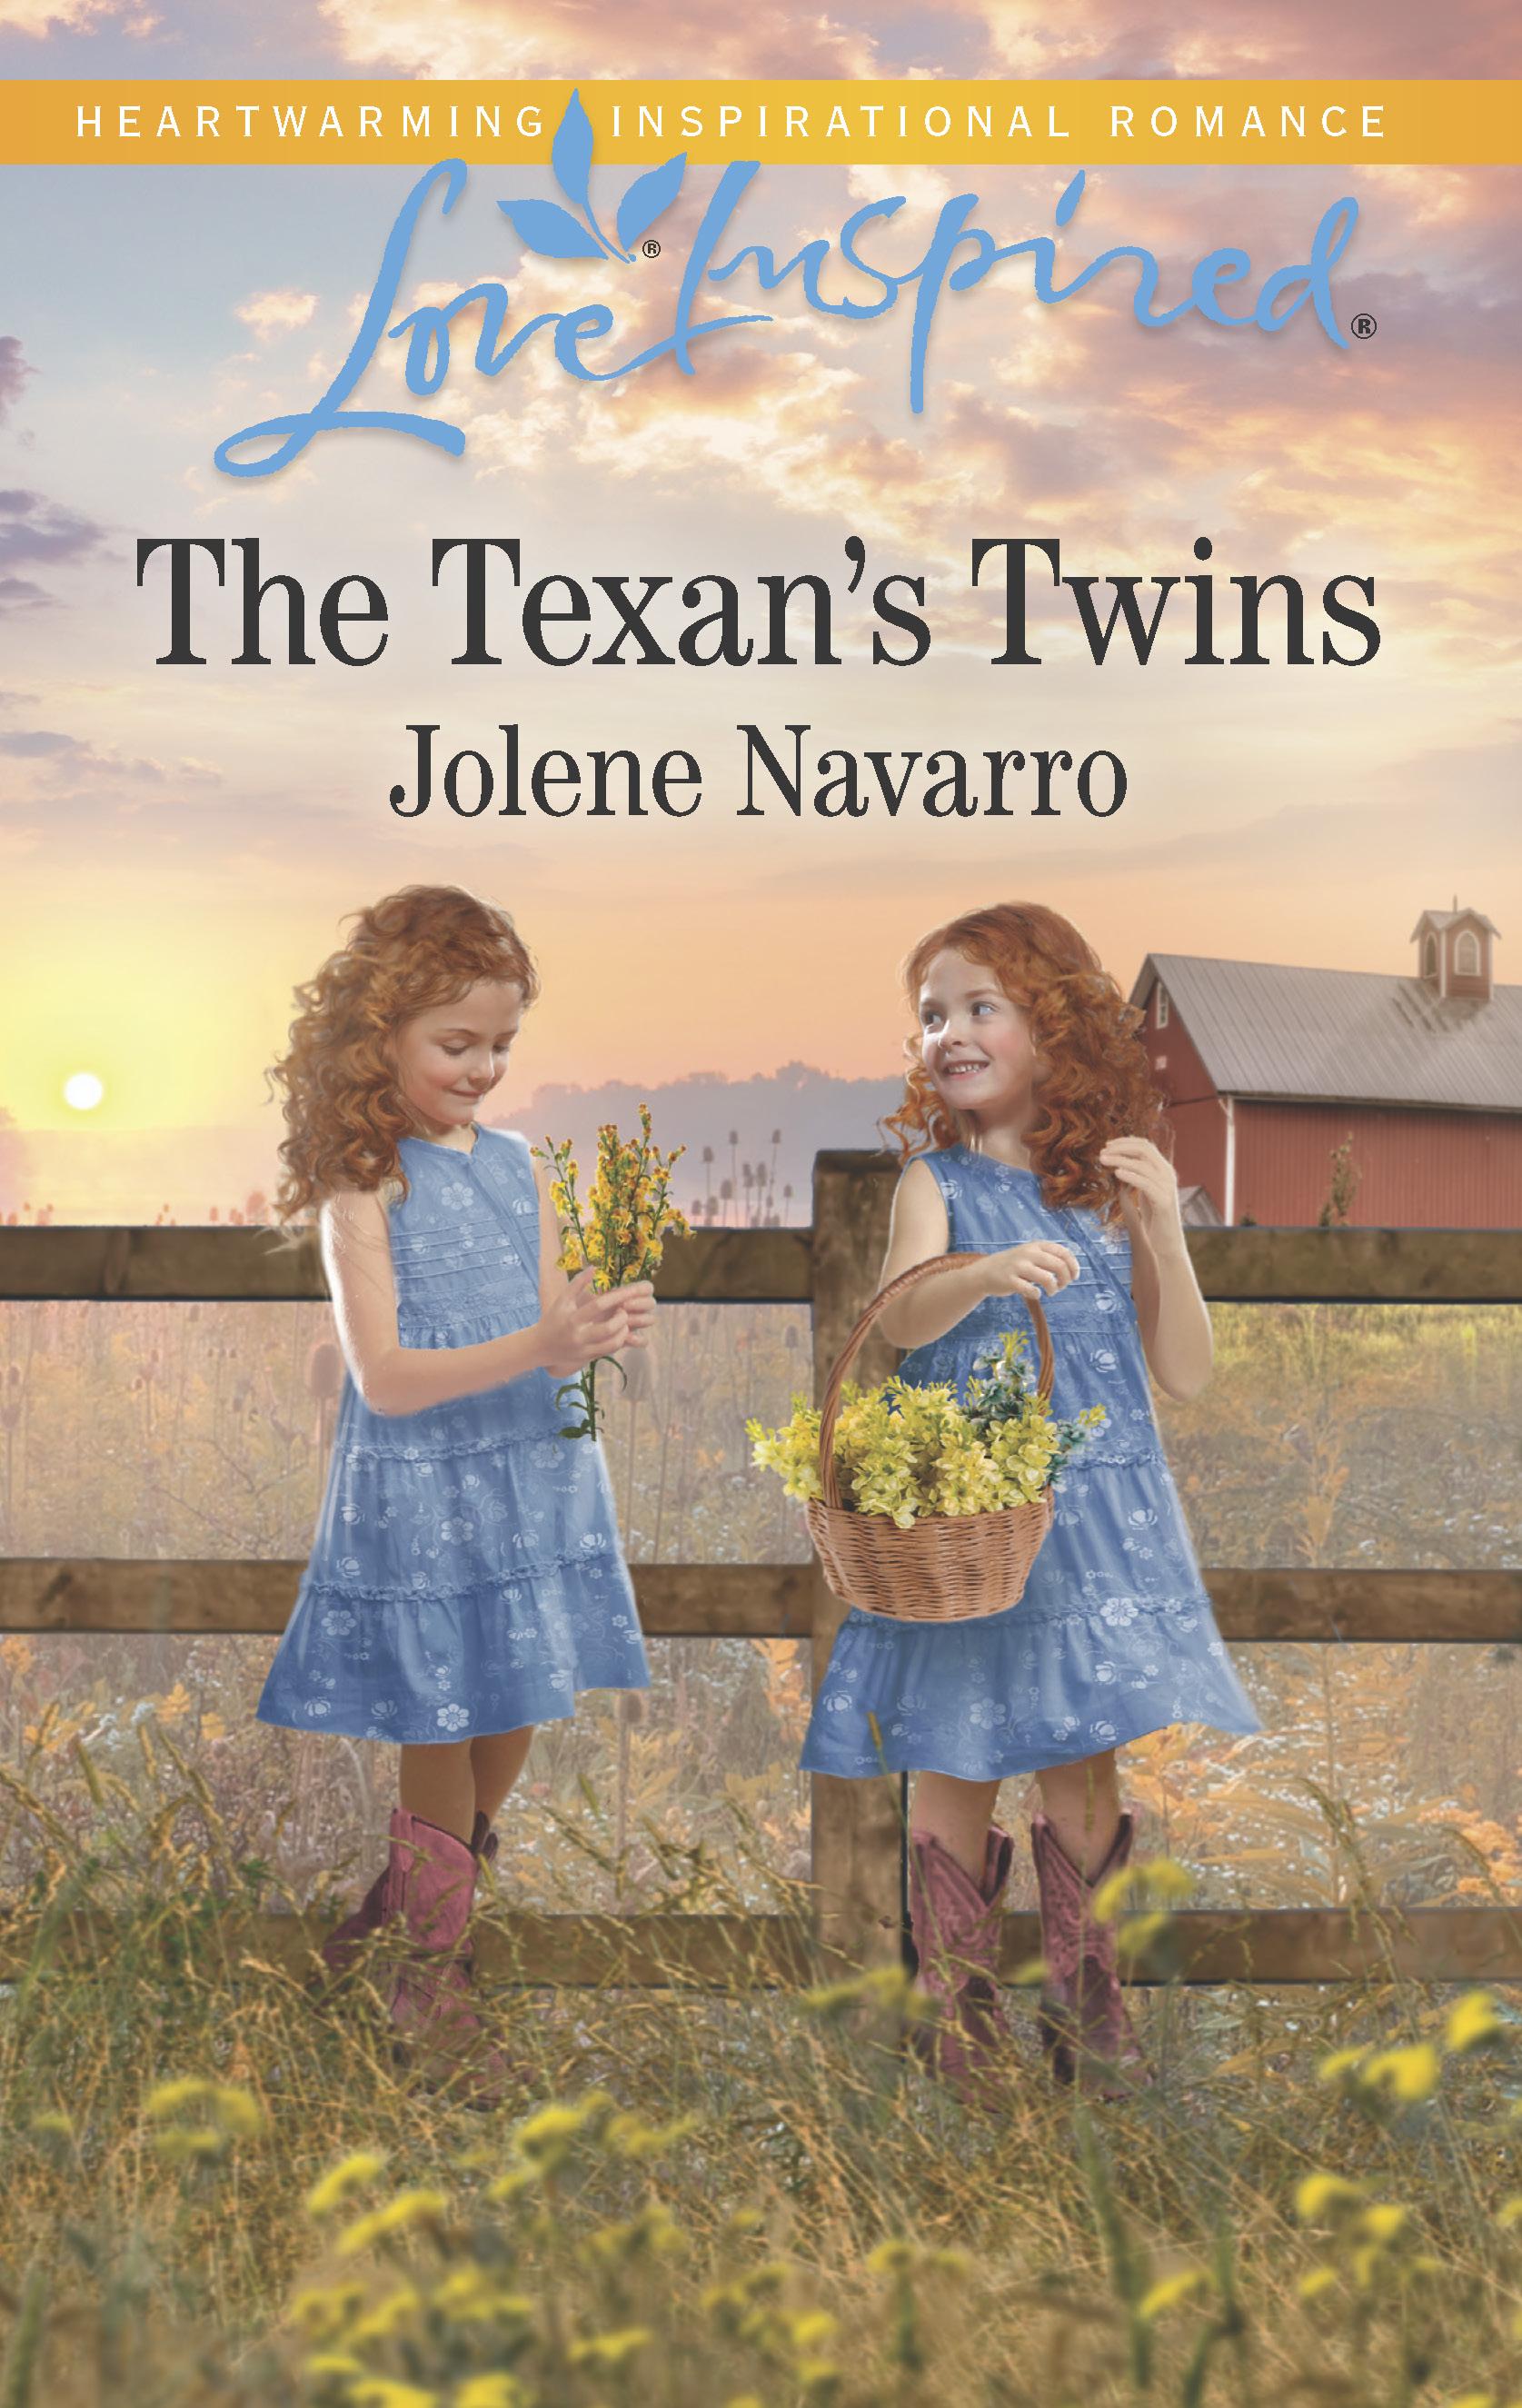 The Texan's Twins - Jolene Navarro